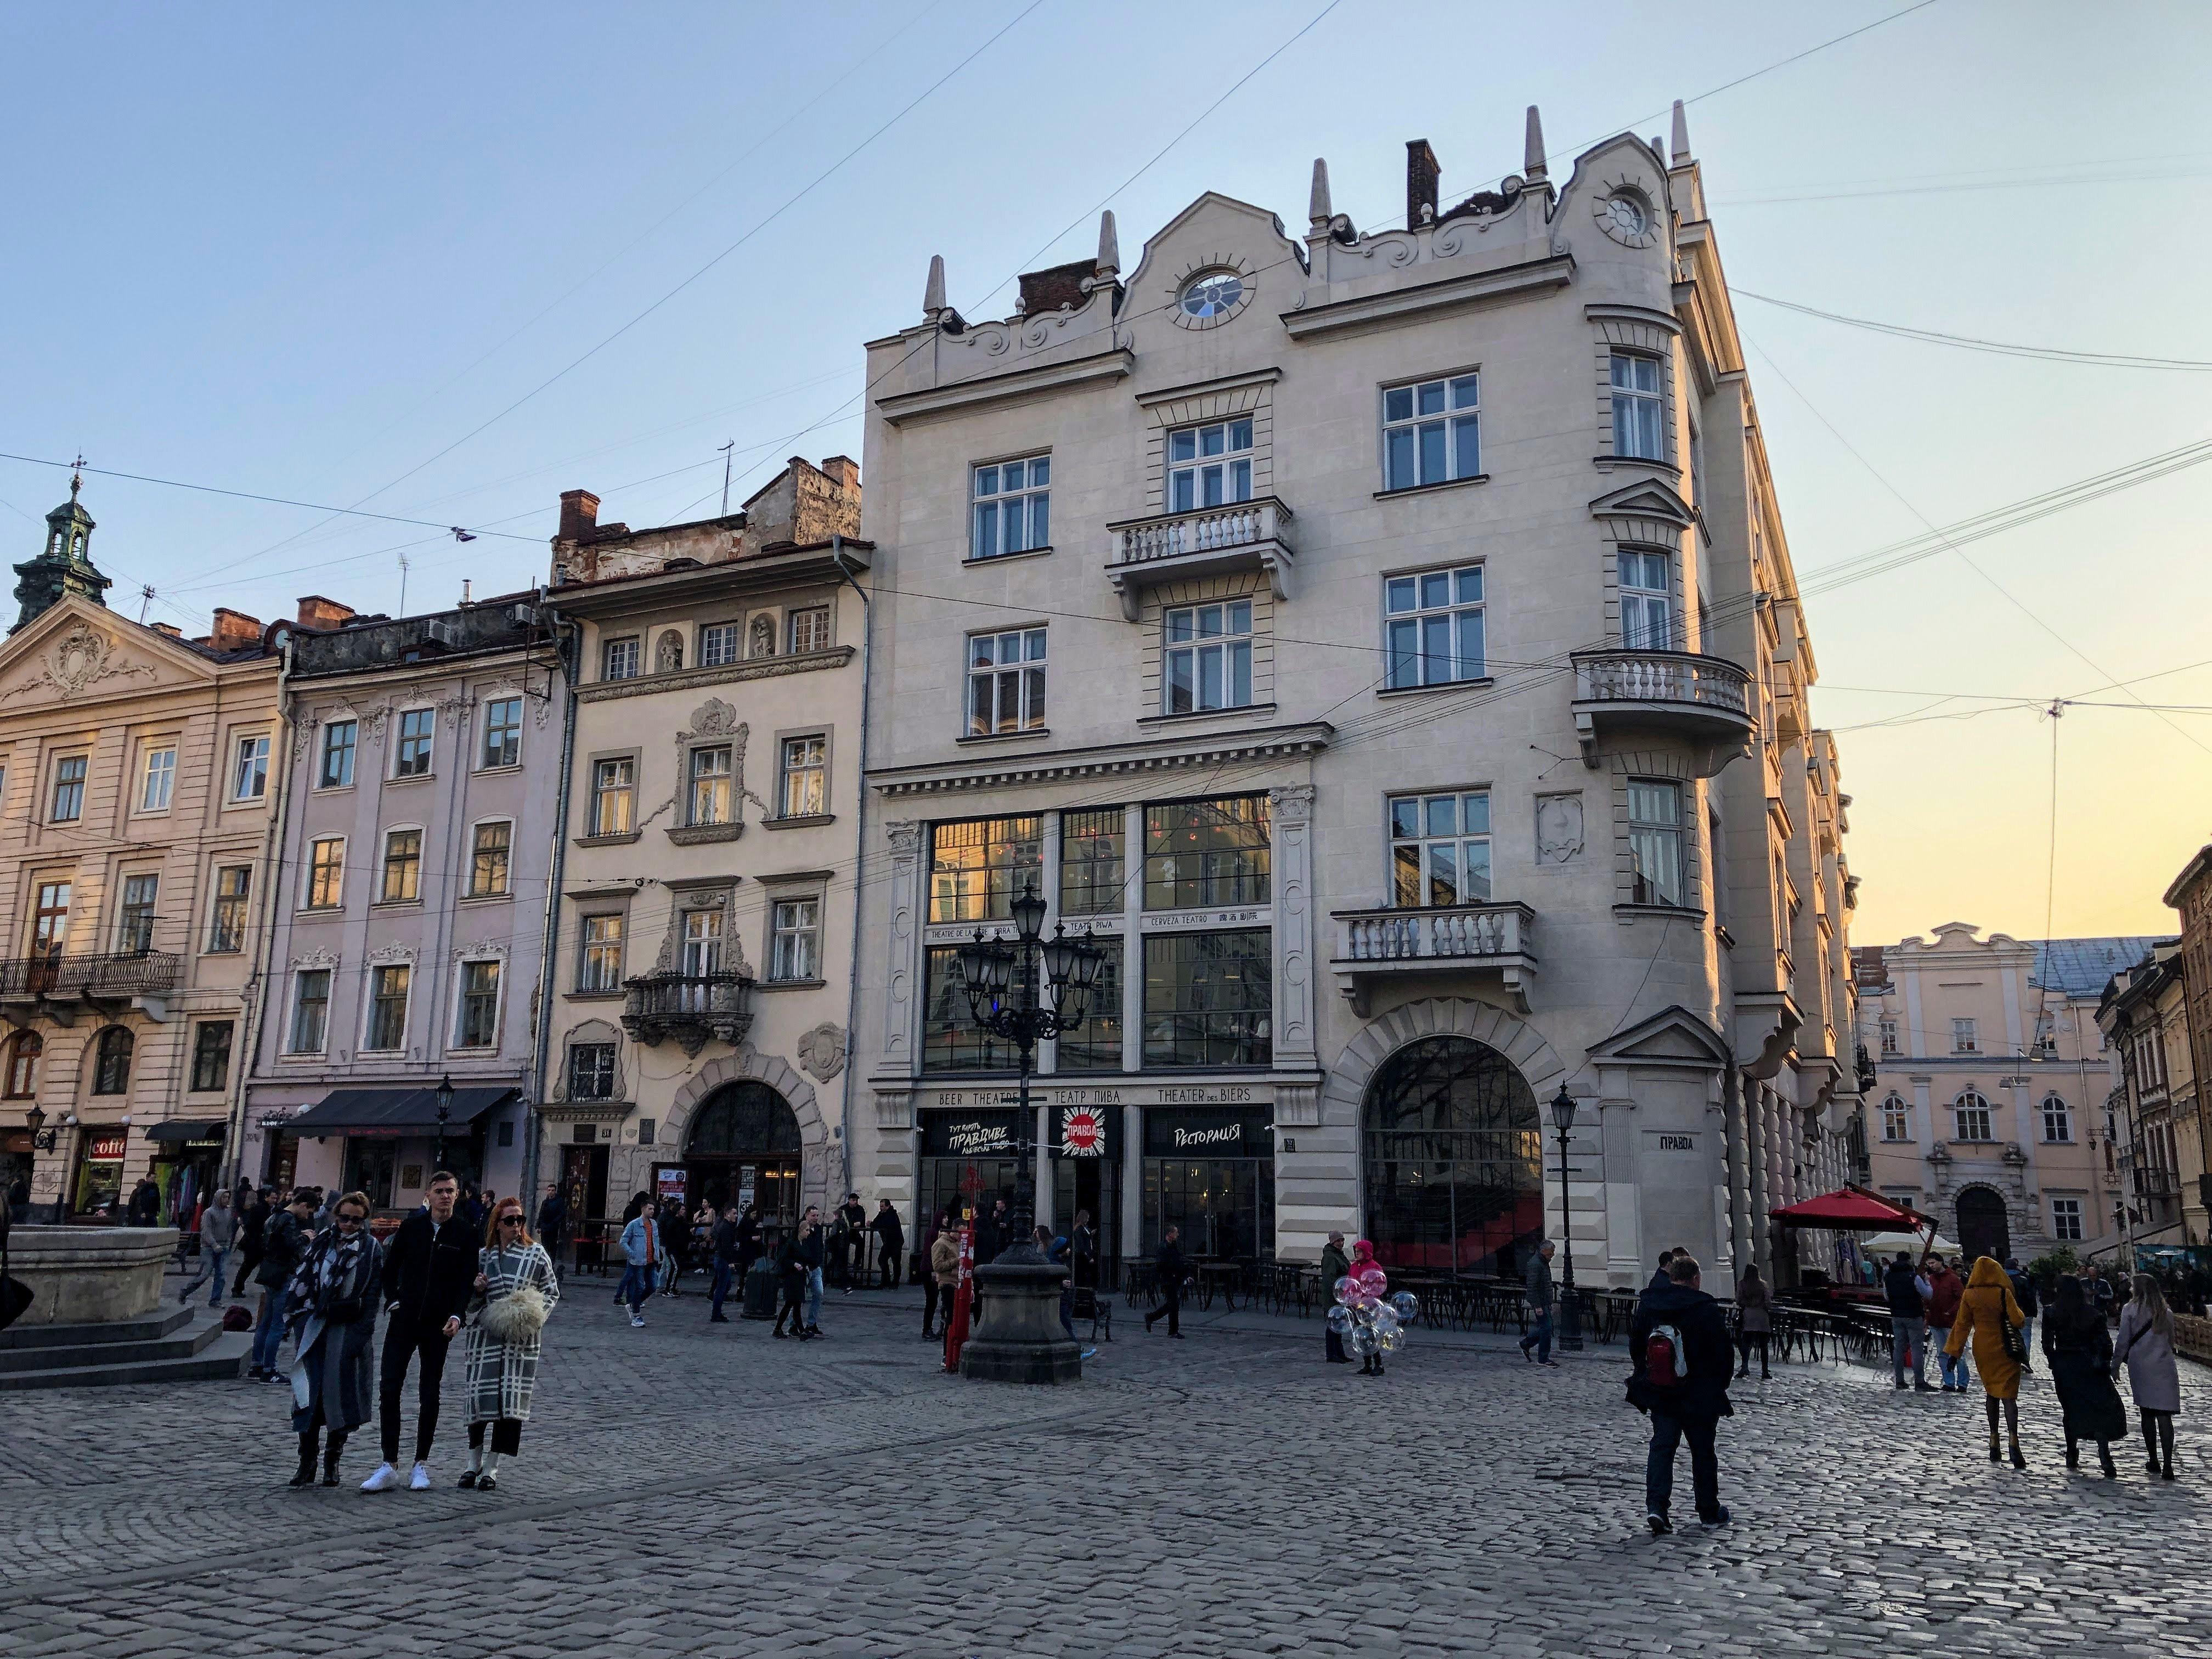 Pravda Beer Theater in Lviv, Ukraine